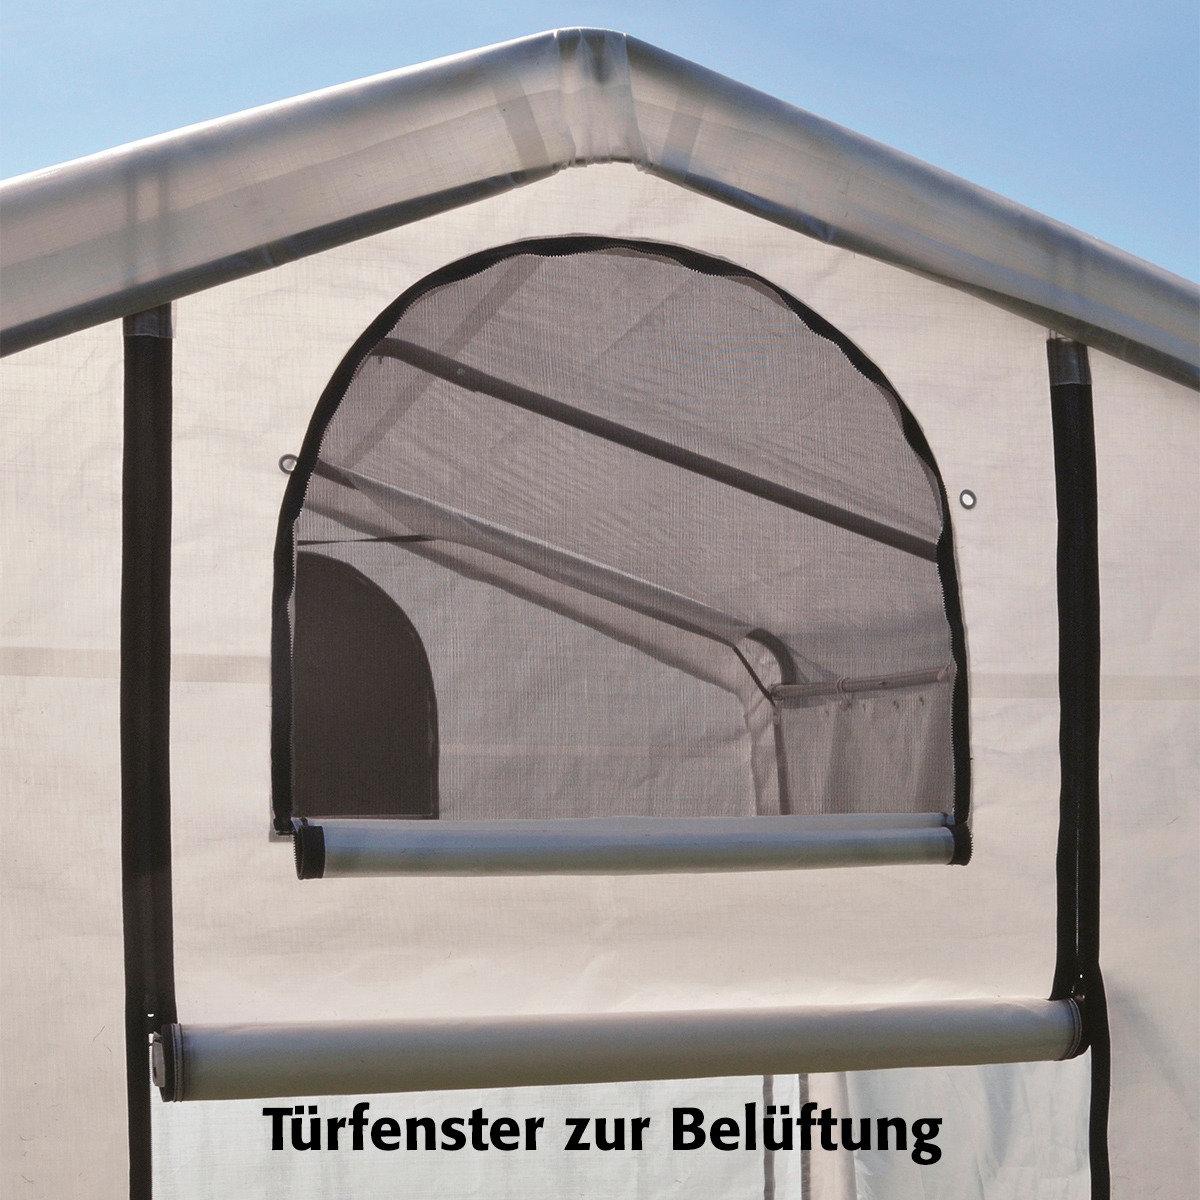 ShelterLogic Folien-Gewächshaus 5,76m² inkl. Sturmanker | #2